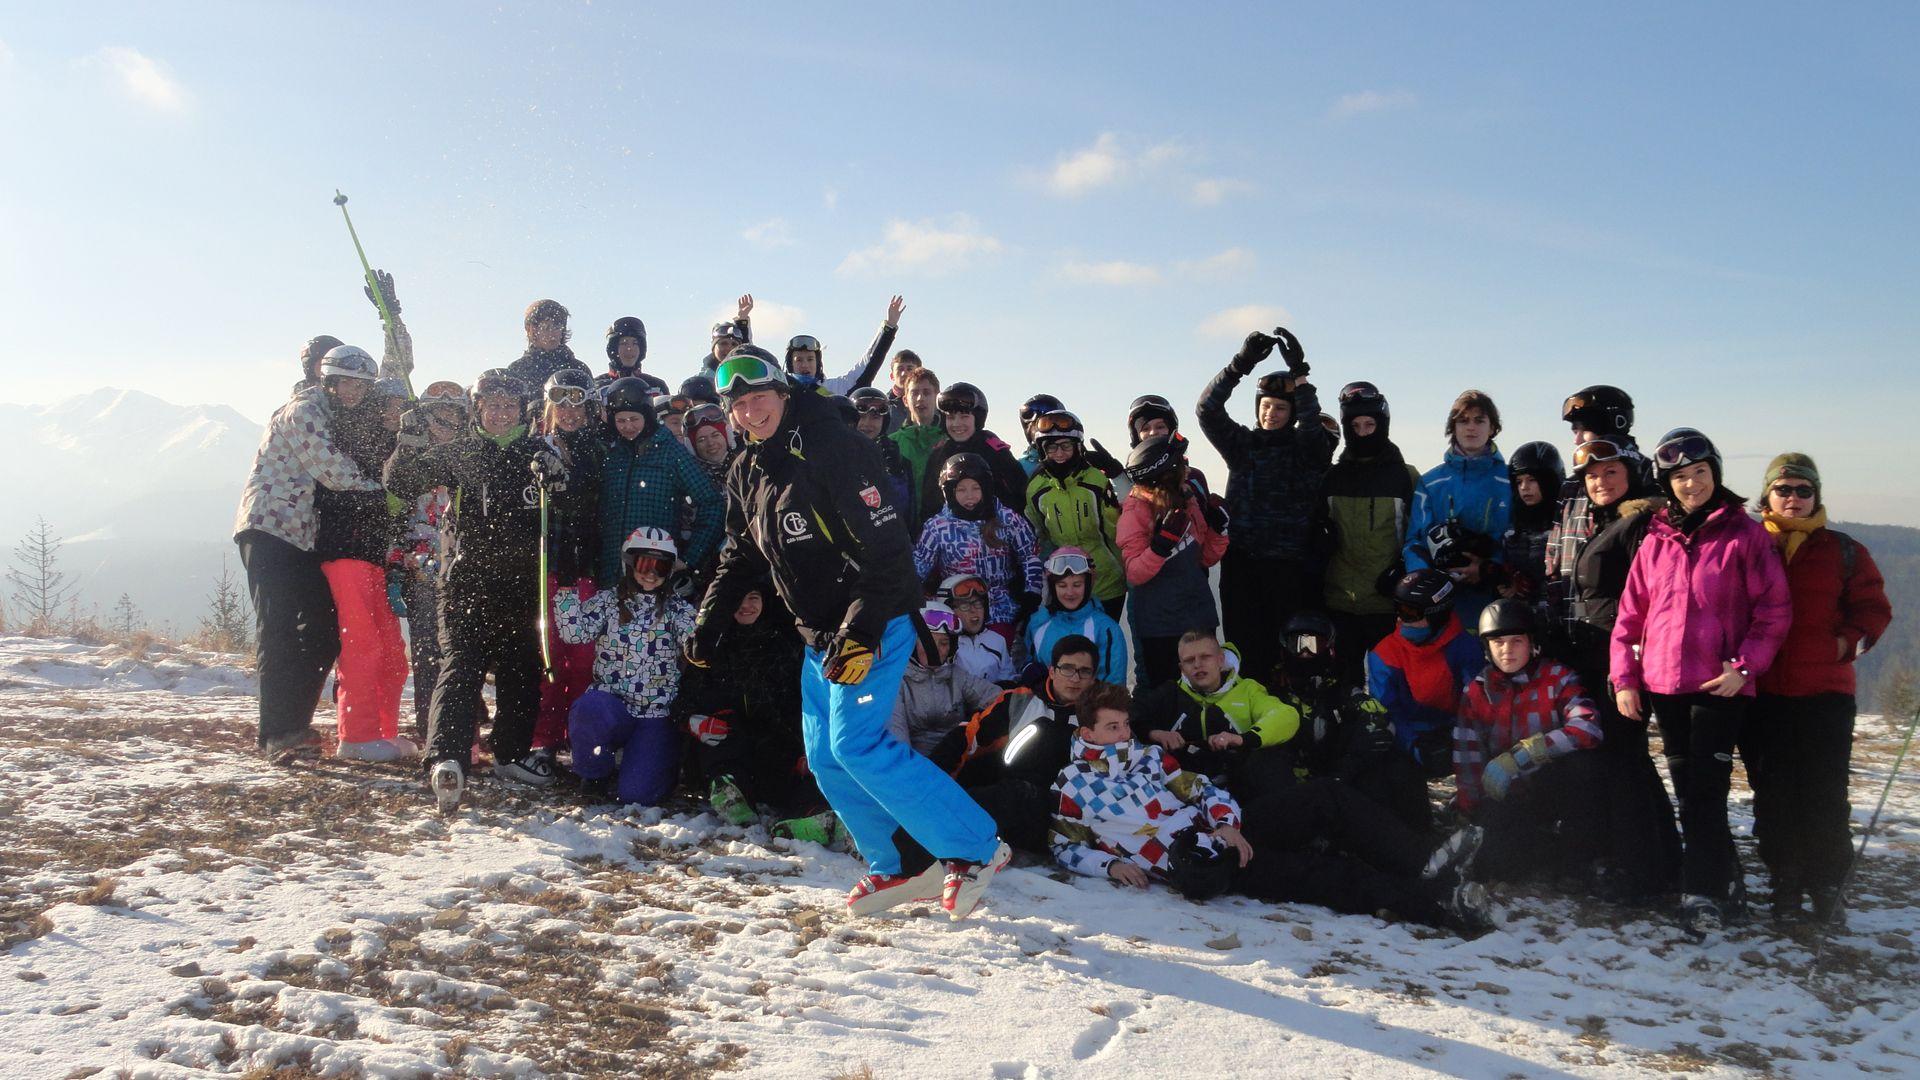 CarTourist_narty-snowboard_2014-foto-17